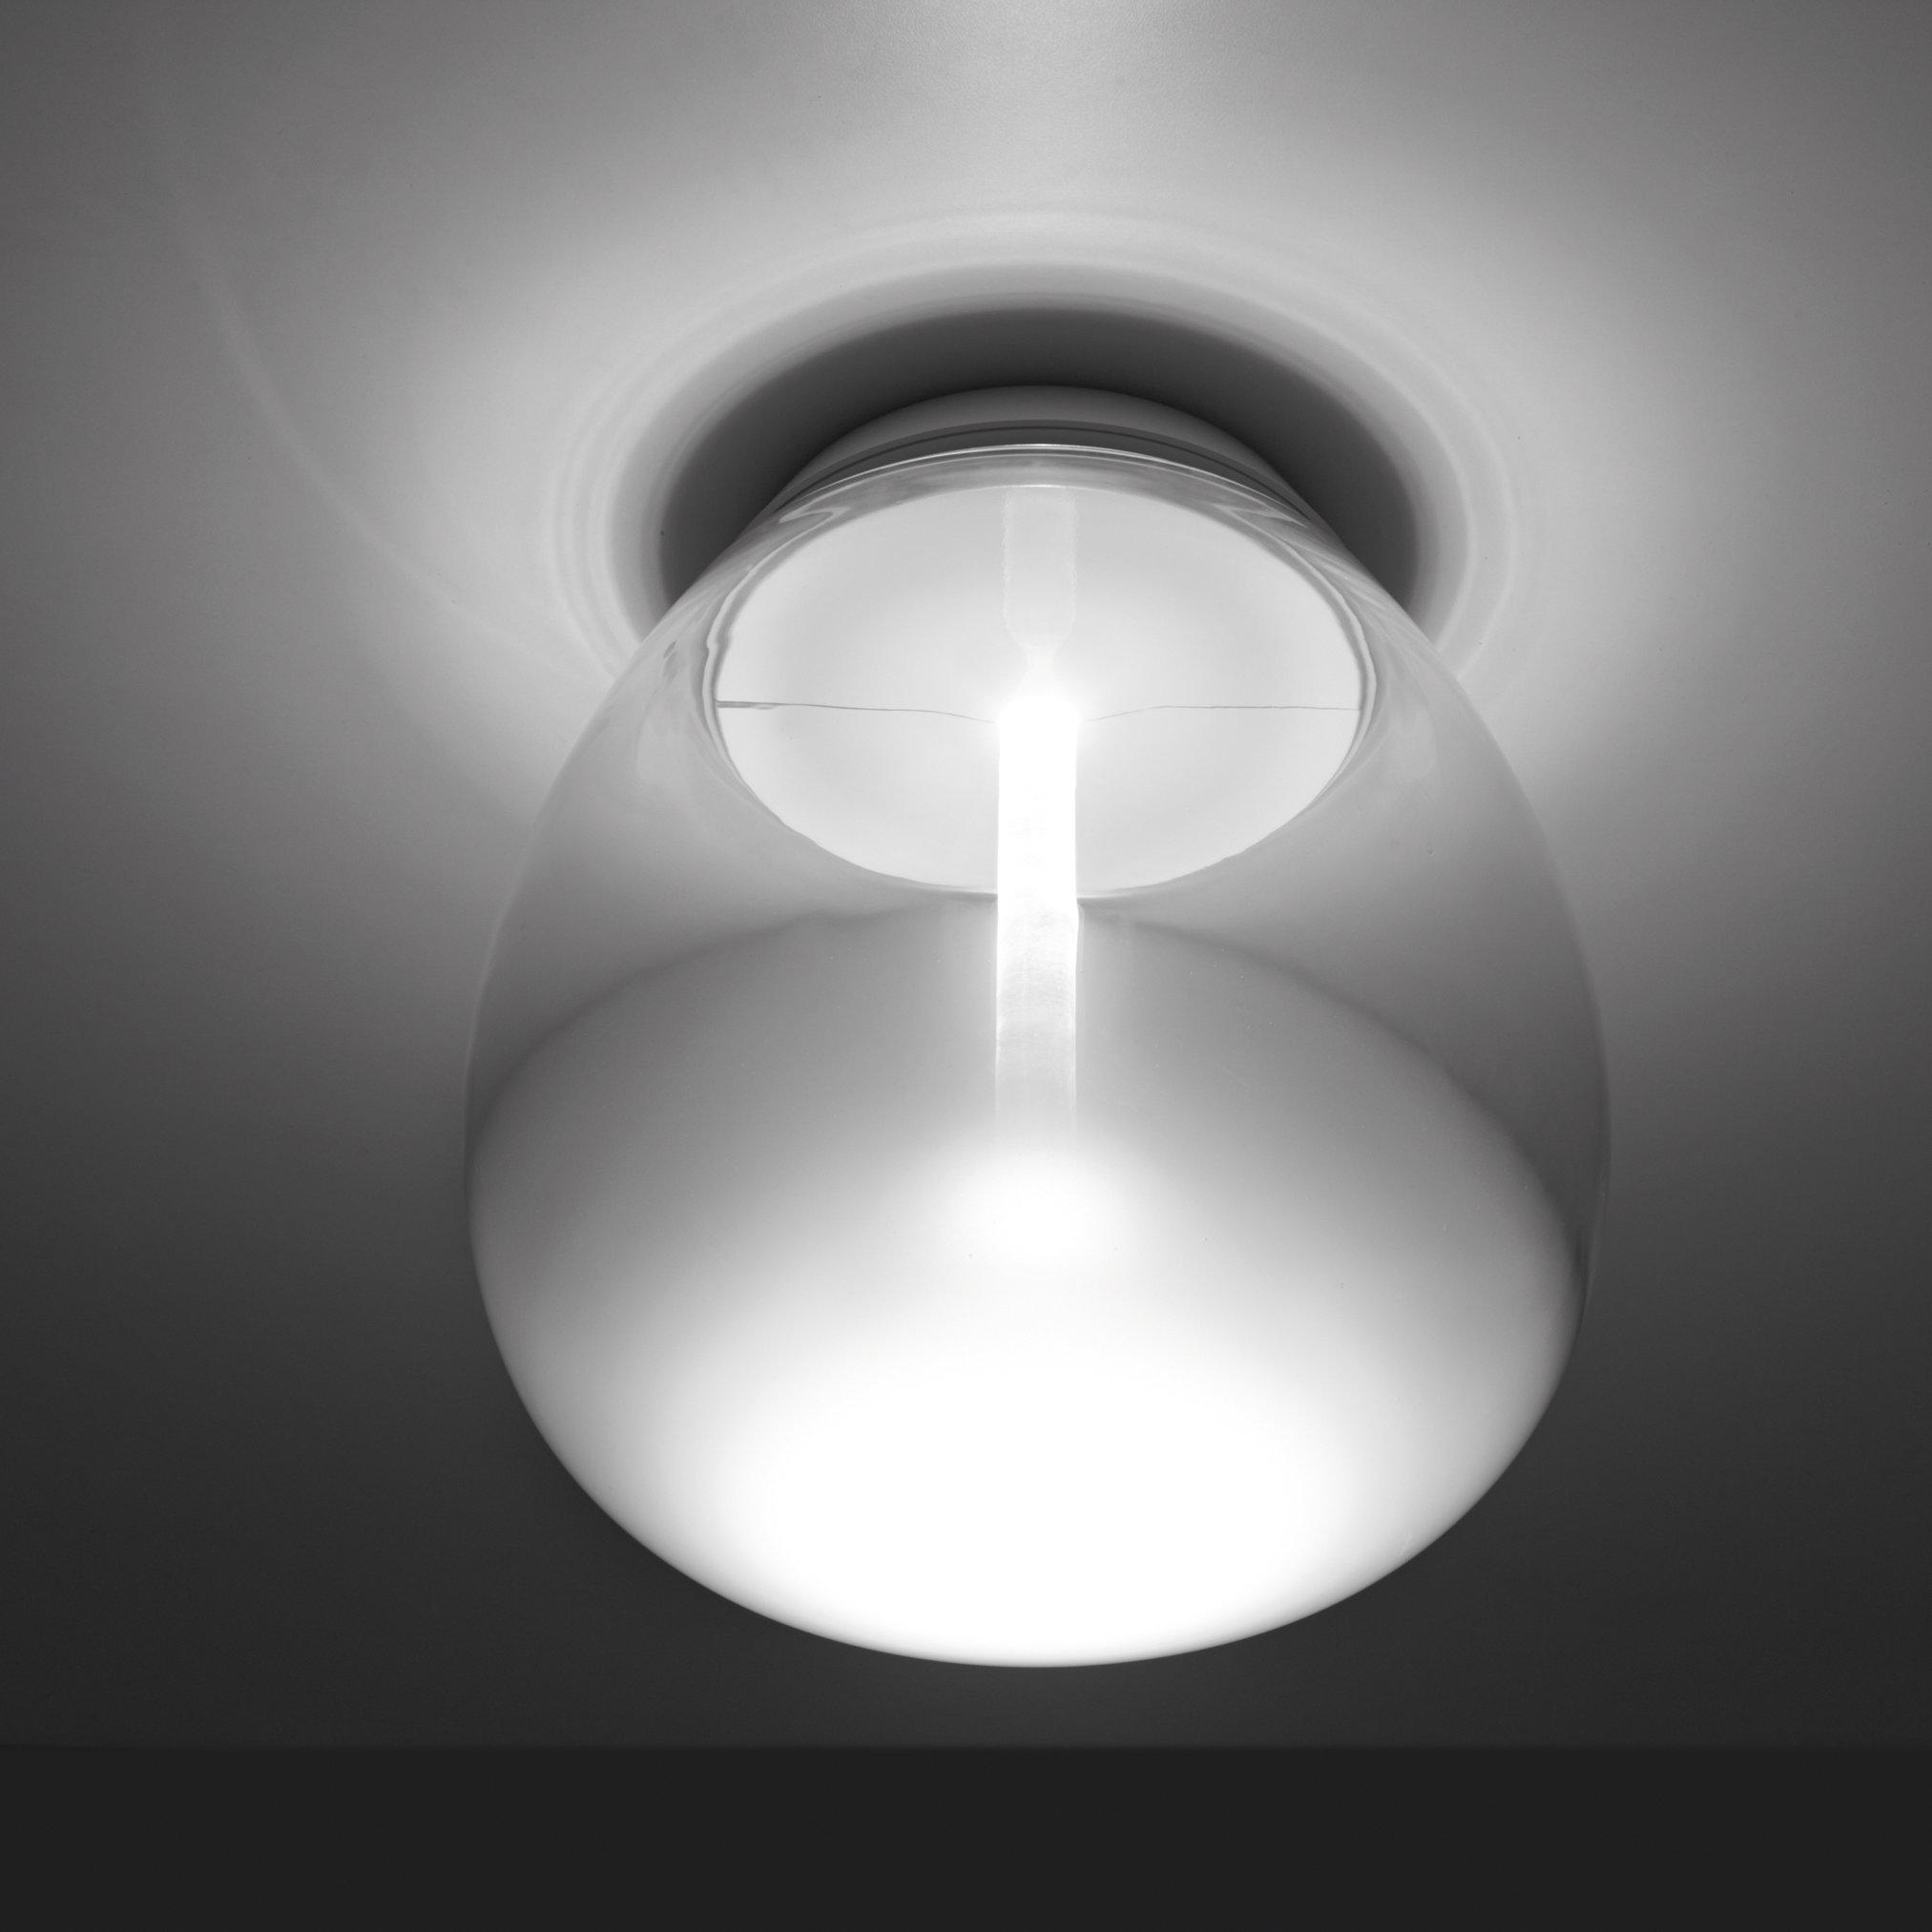 artemide empatia 36 wall ceiling lamp 29w led 1822010a l mparas de dise o. Black Bedroom Furniture Sets. Home Design Ideas